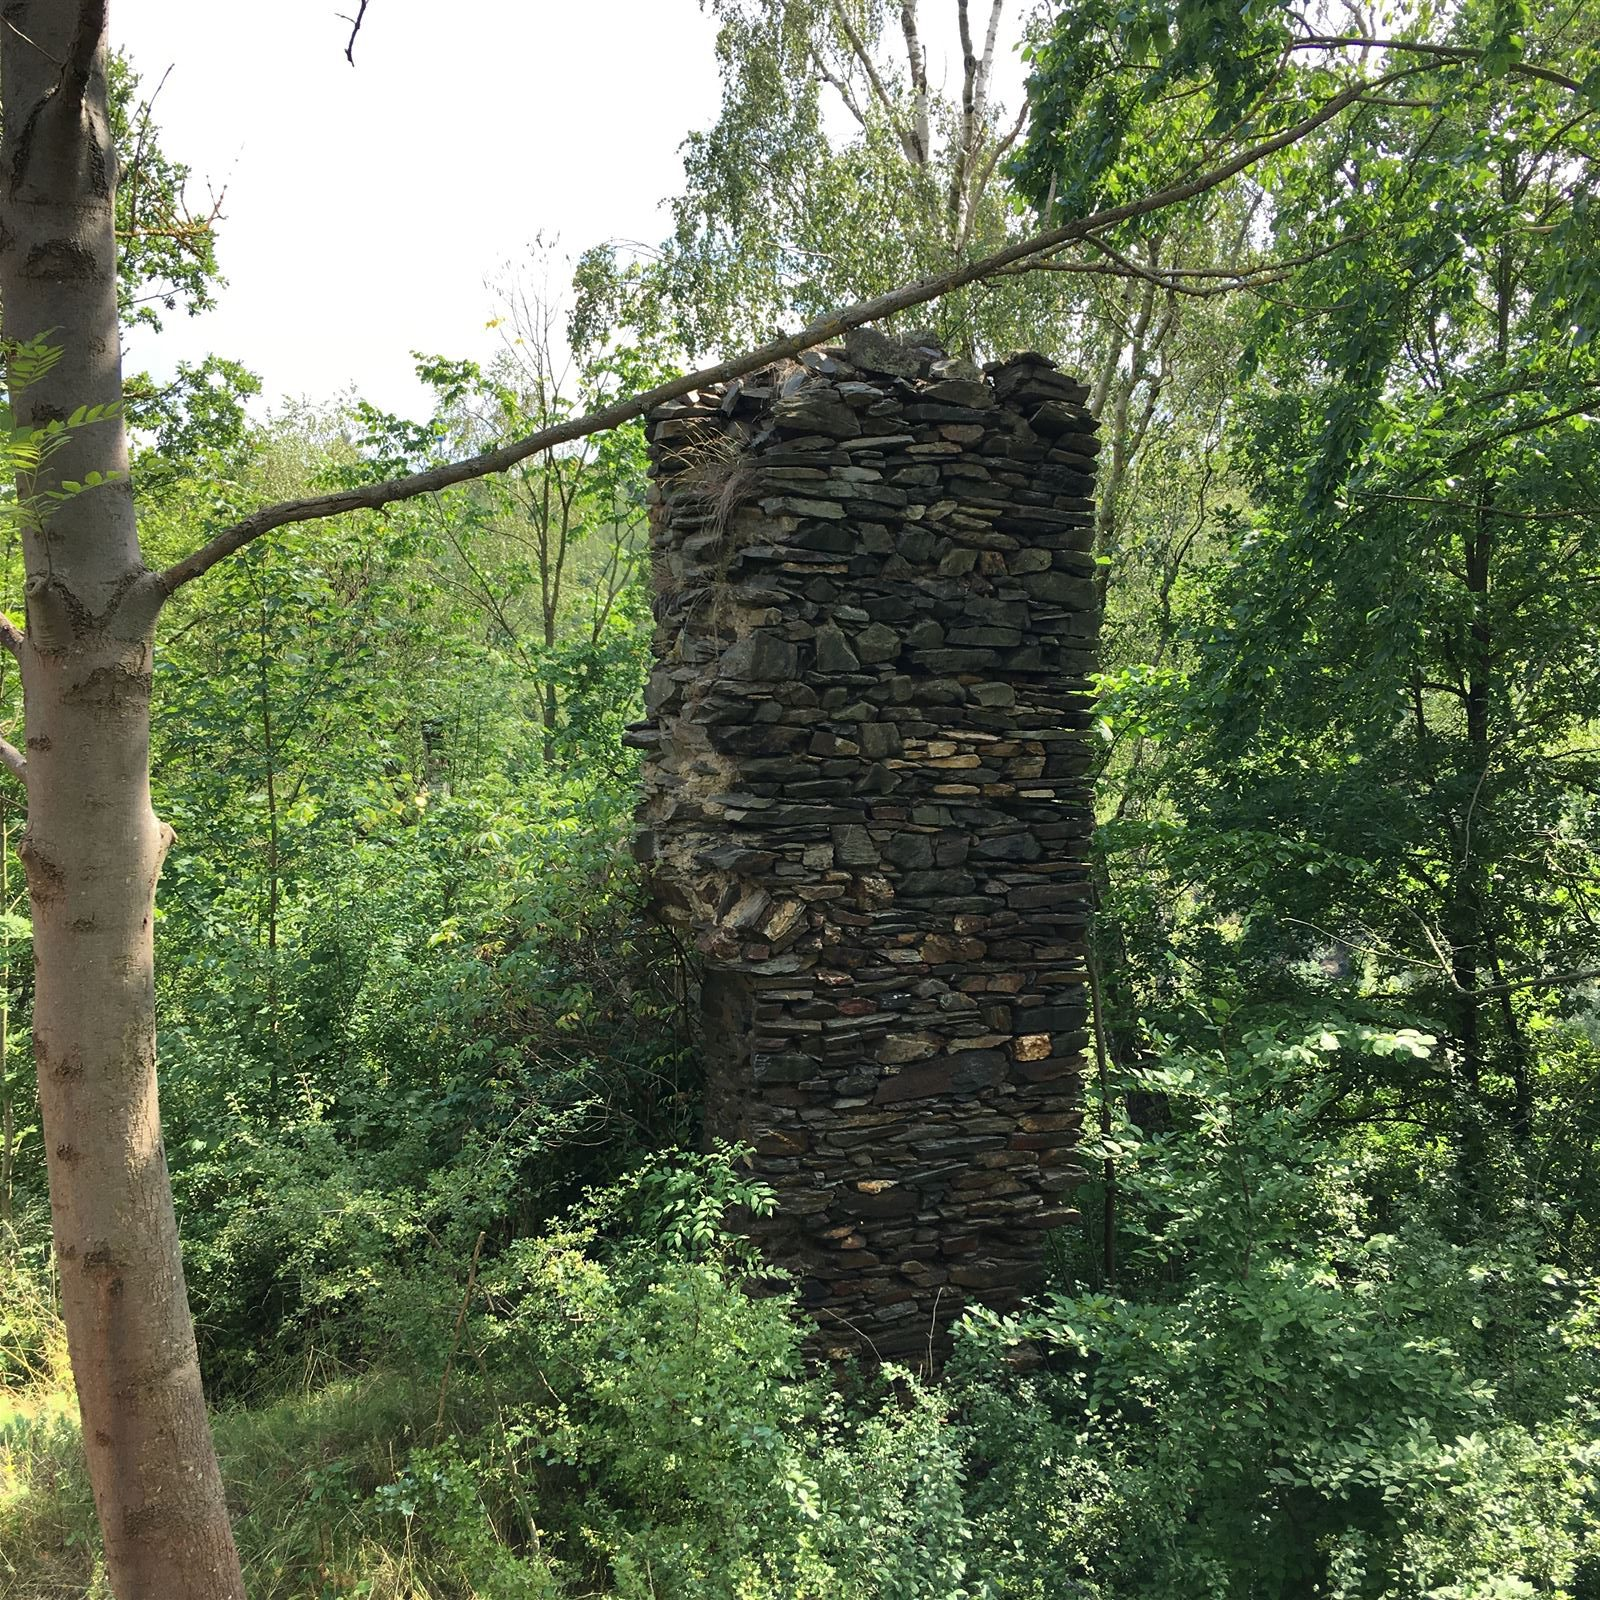 Die Ruine der Burg Sparnberg